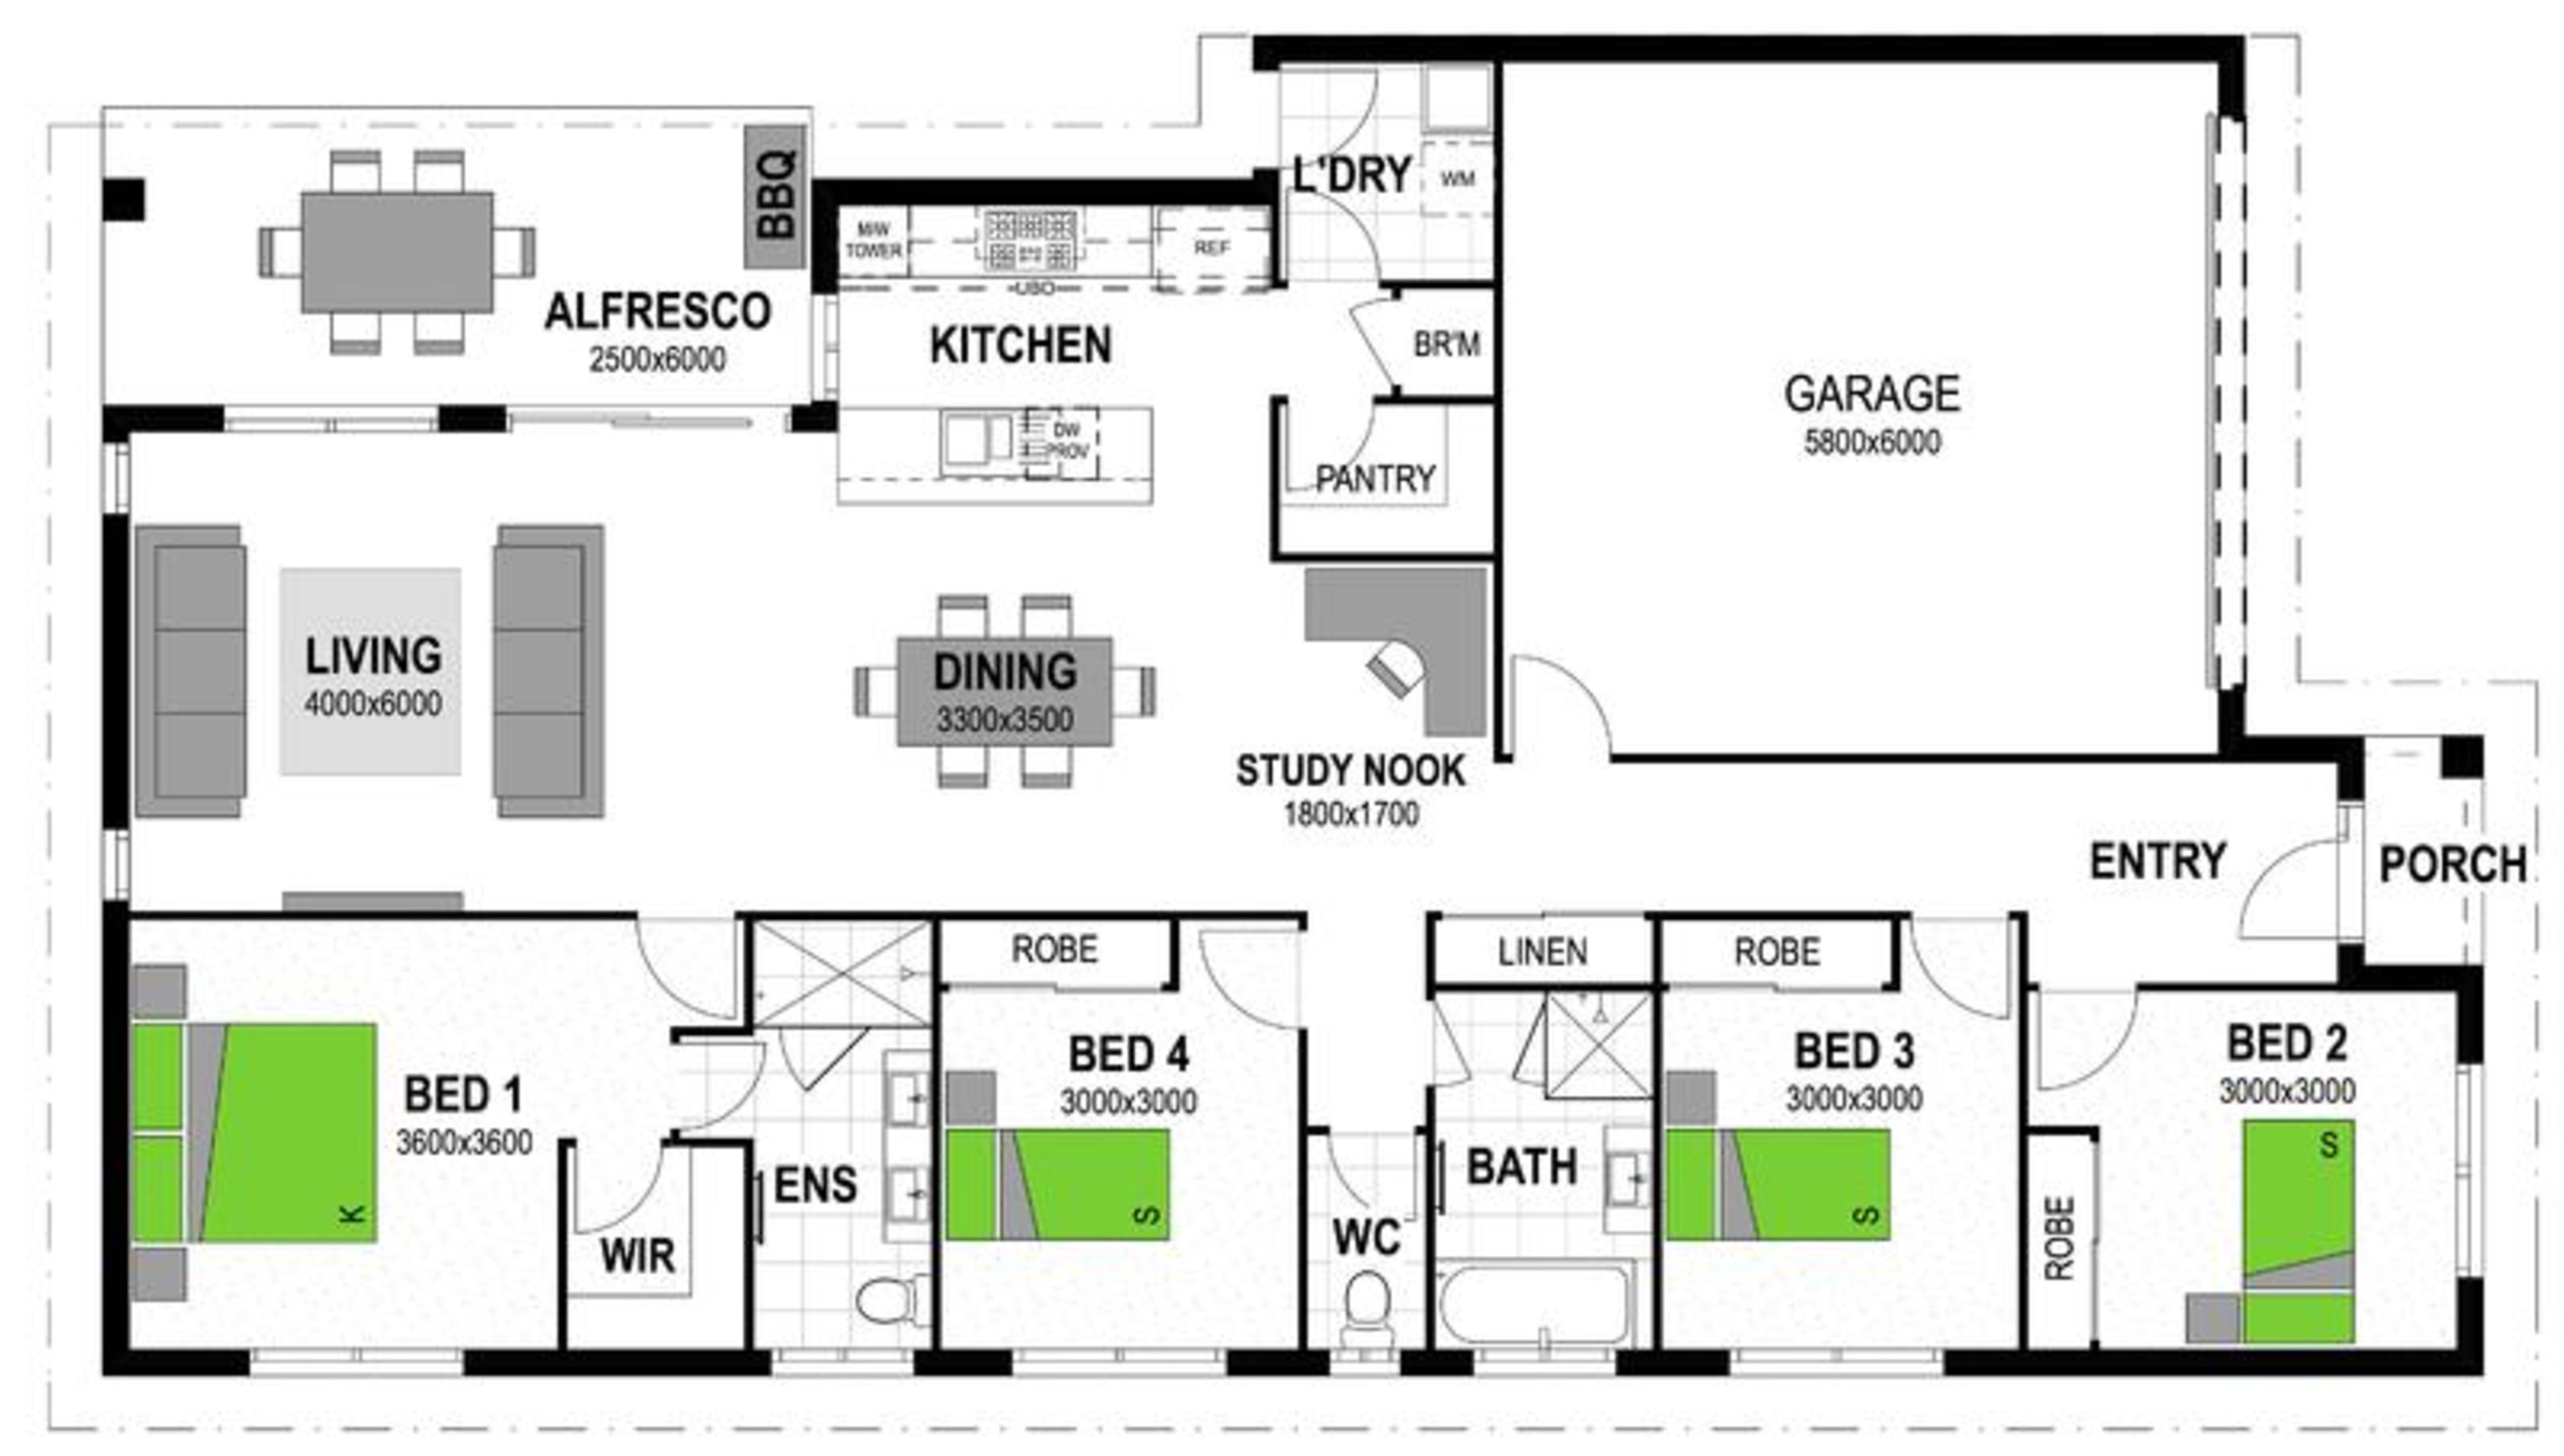 LOT 94 'MONTEREA ESTATE' RIPLEY Floorplan